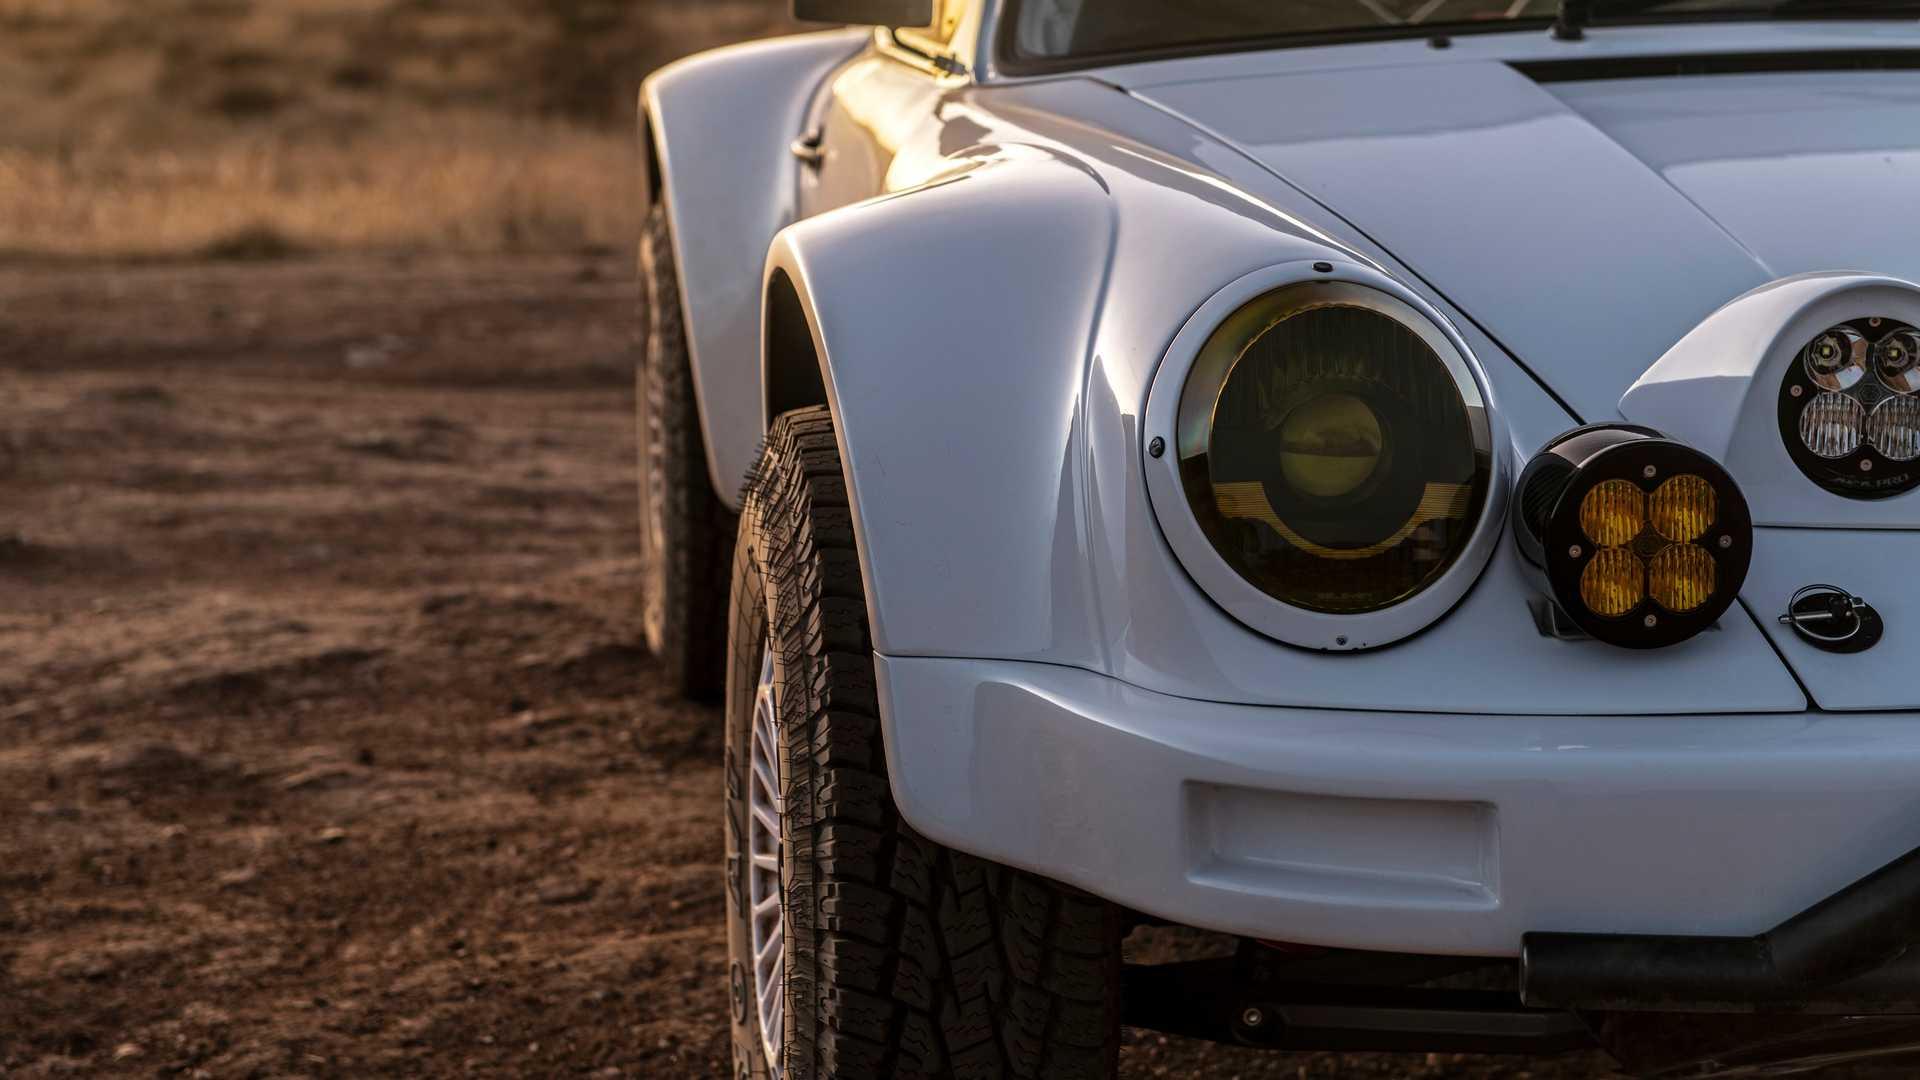 russell-built-fabrications-911-baja-2019-12-21T223250.735